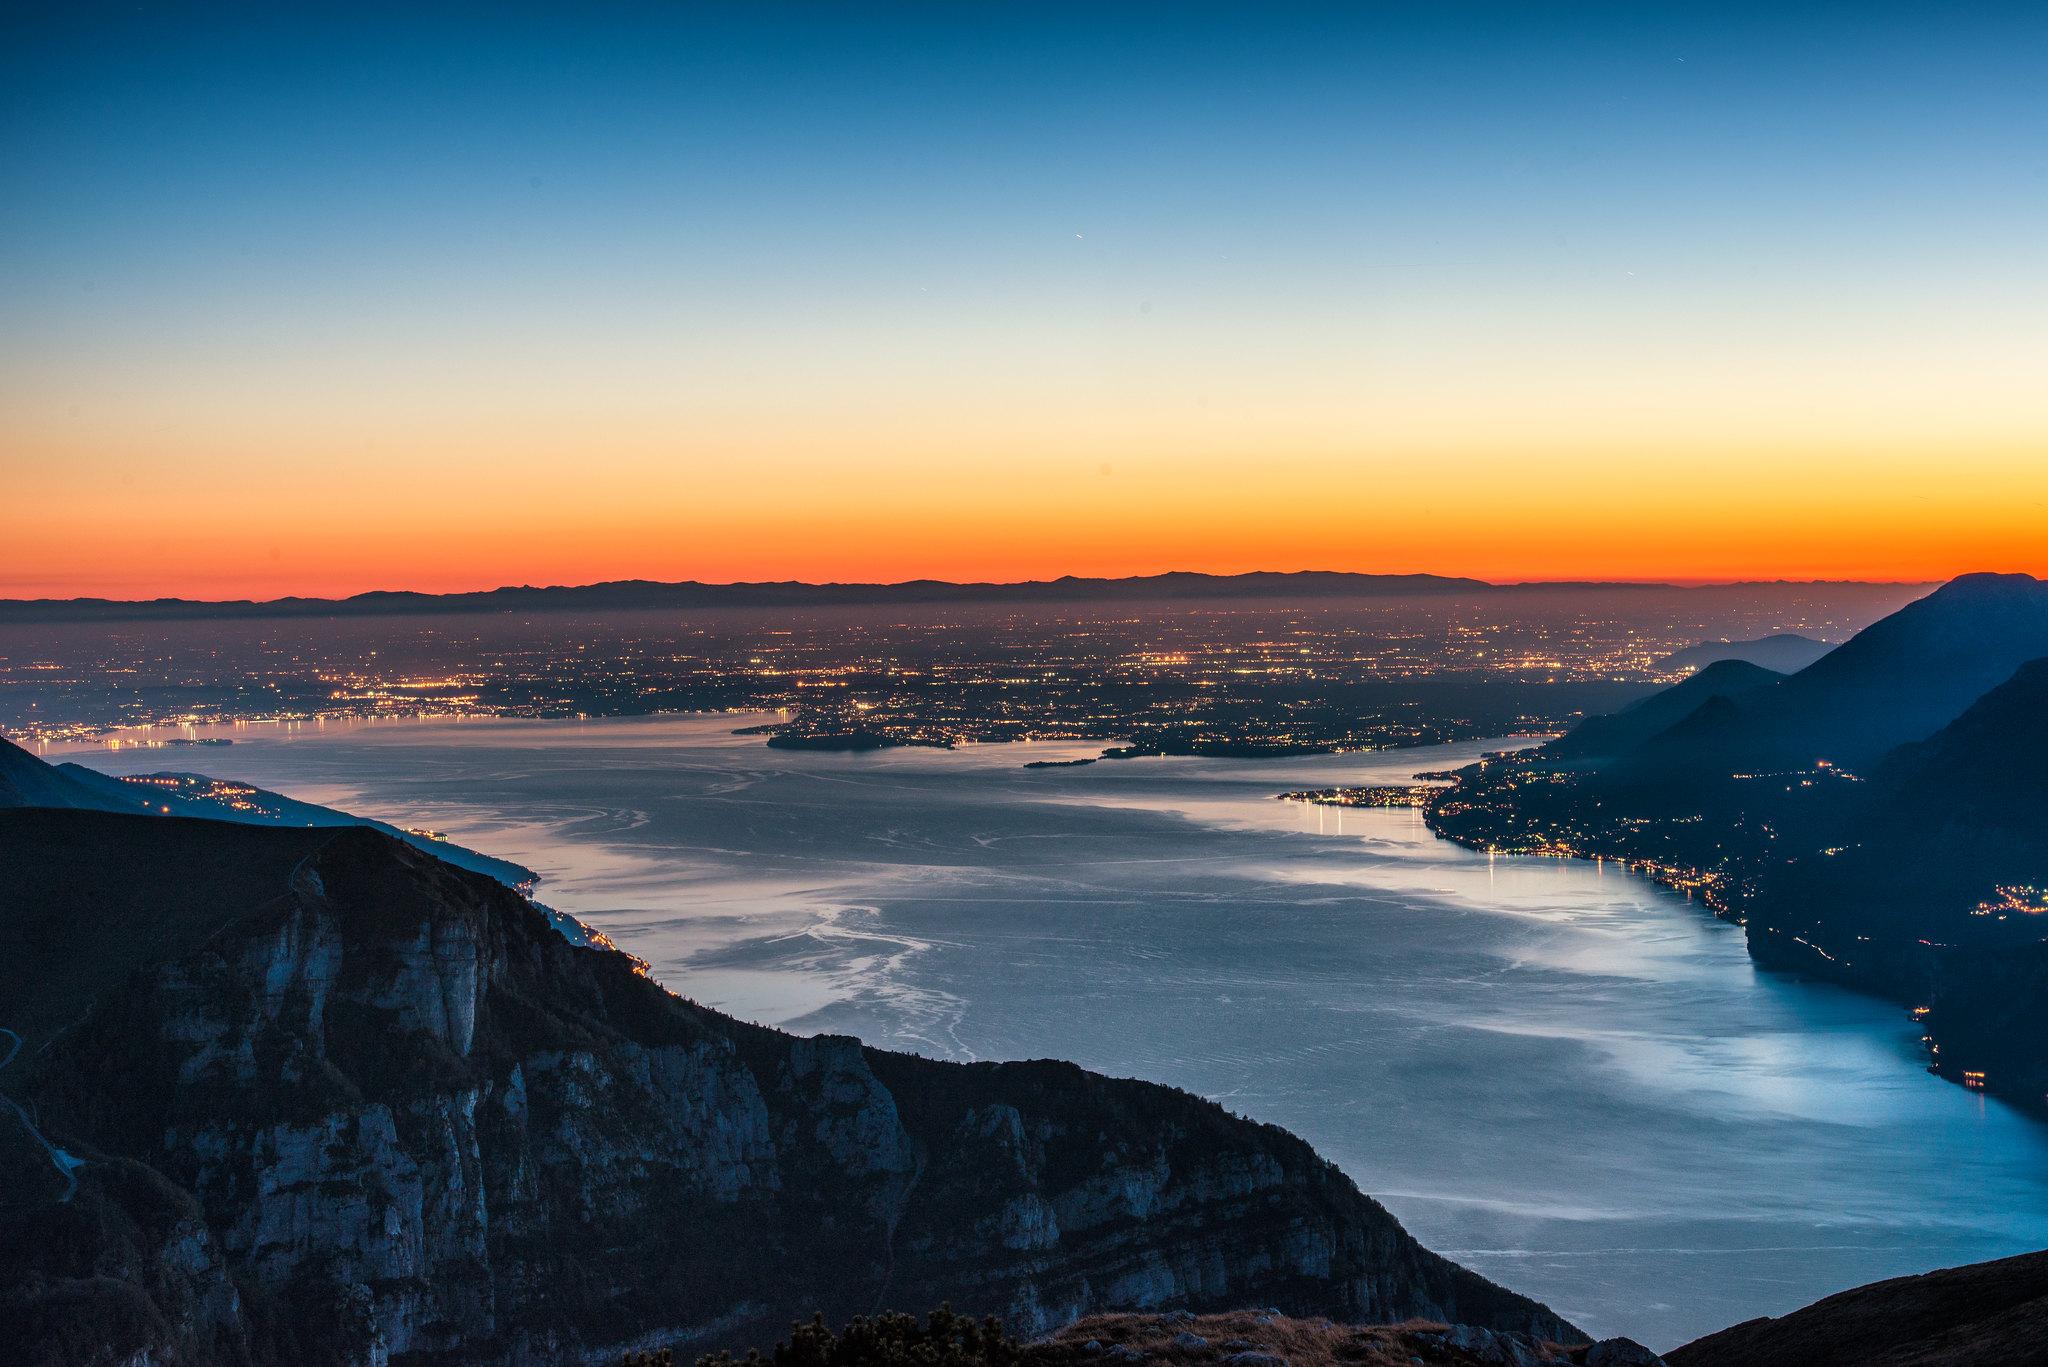 Overview on lake Garda, Italy